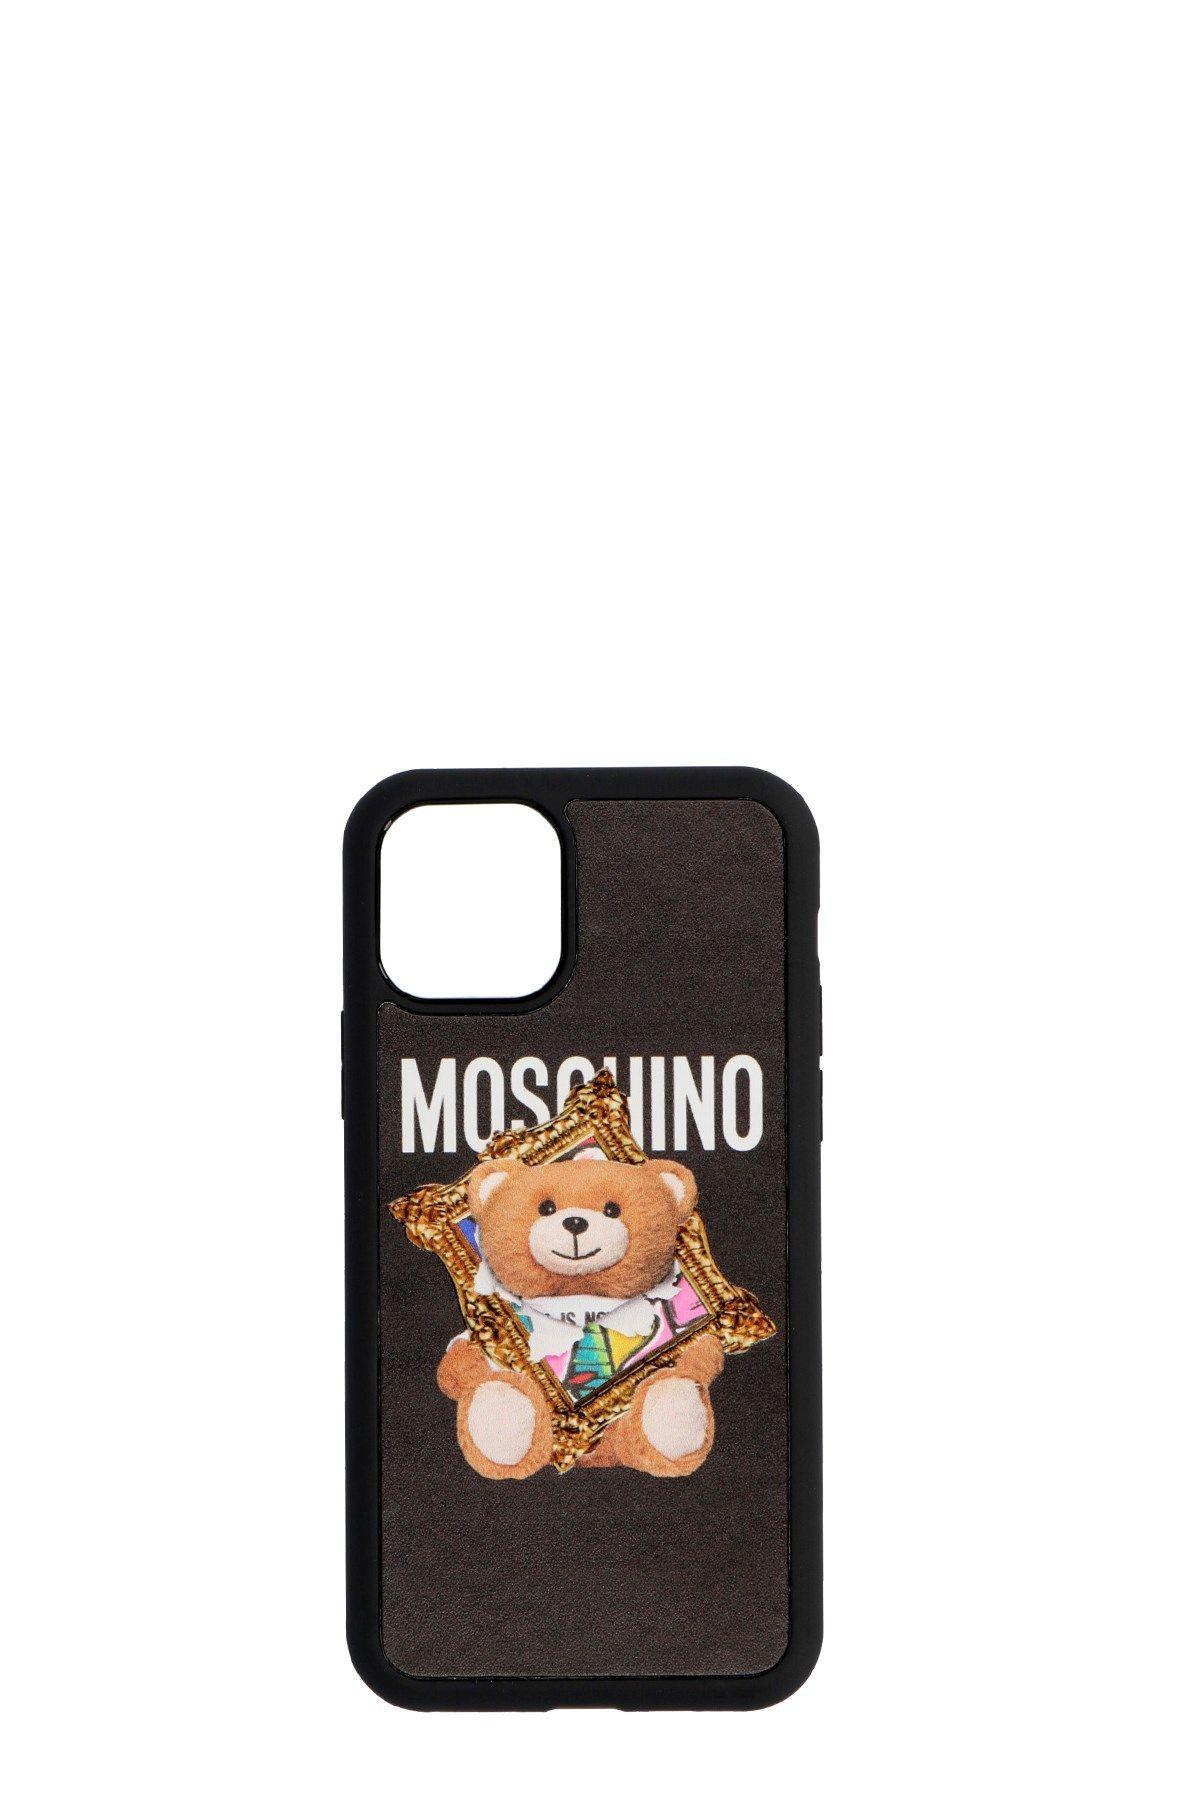 MOSCHINO WOMEN'S A791883121555 BLACK PVC COVER